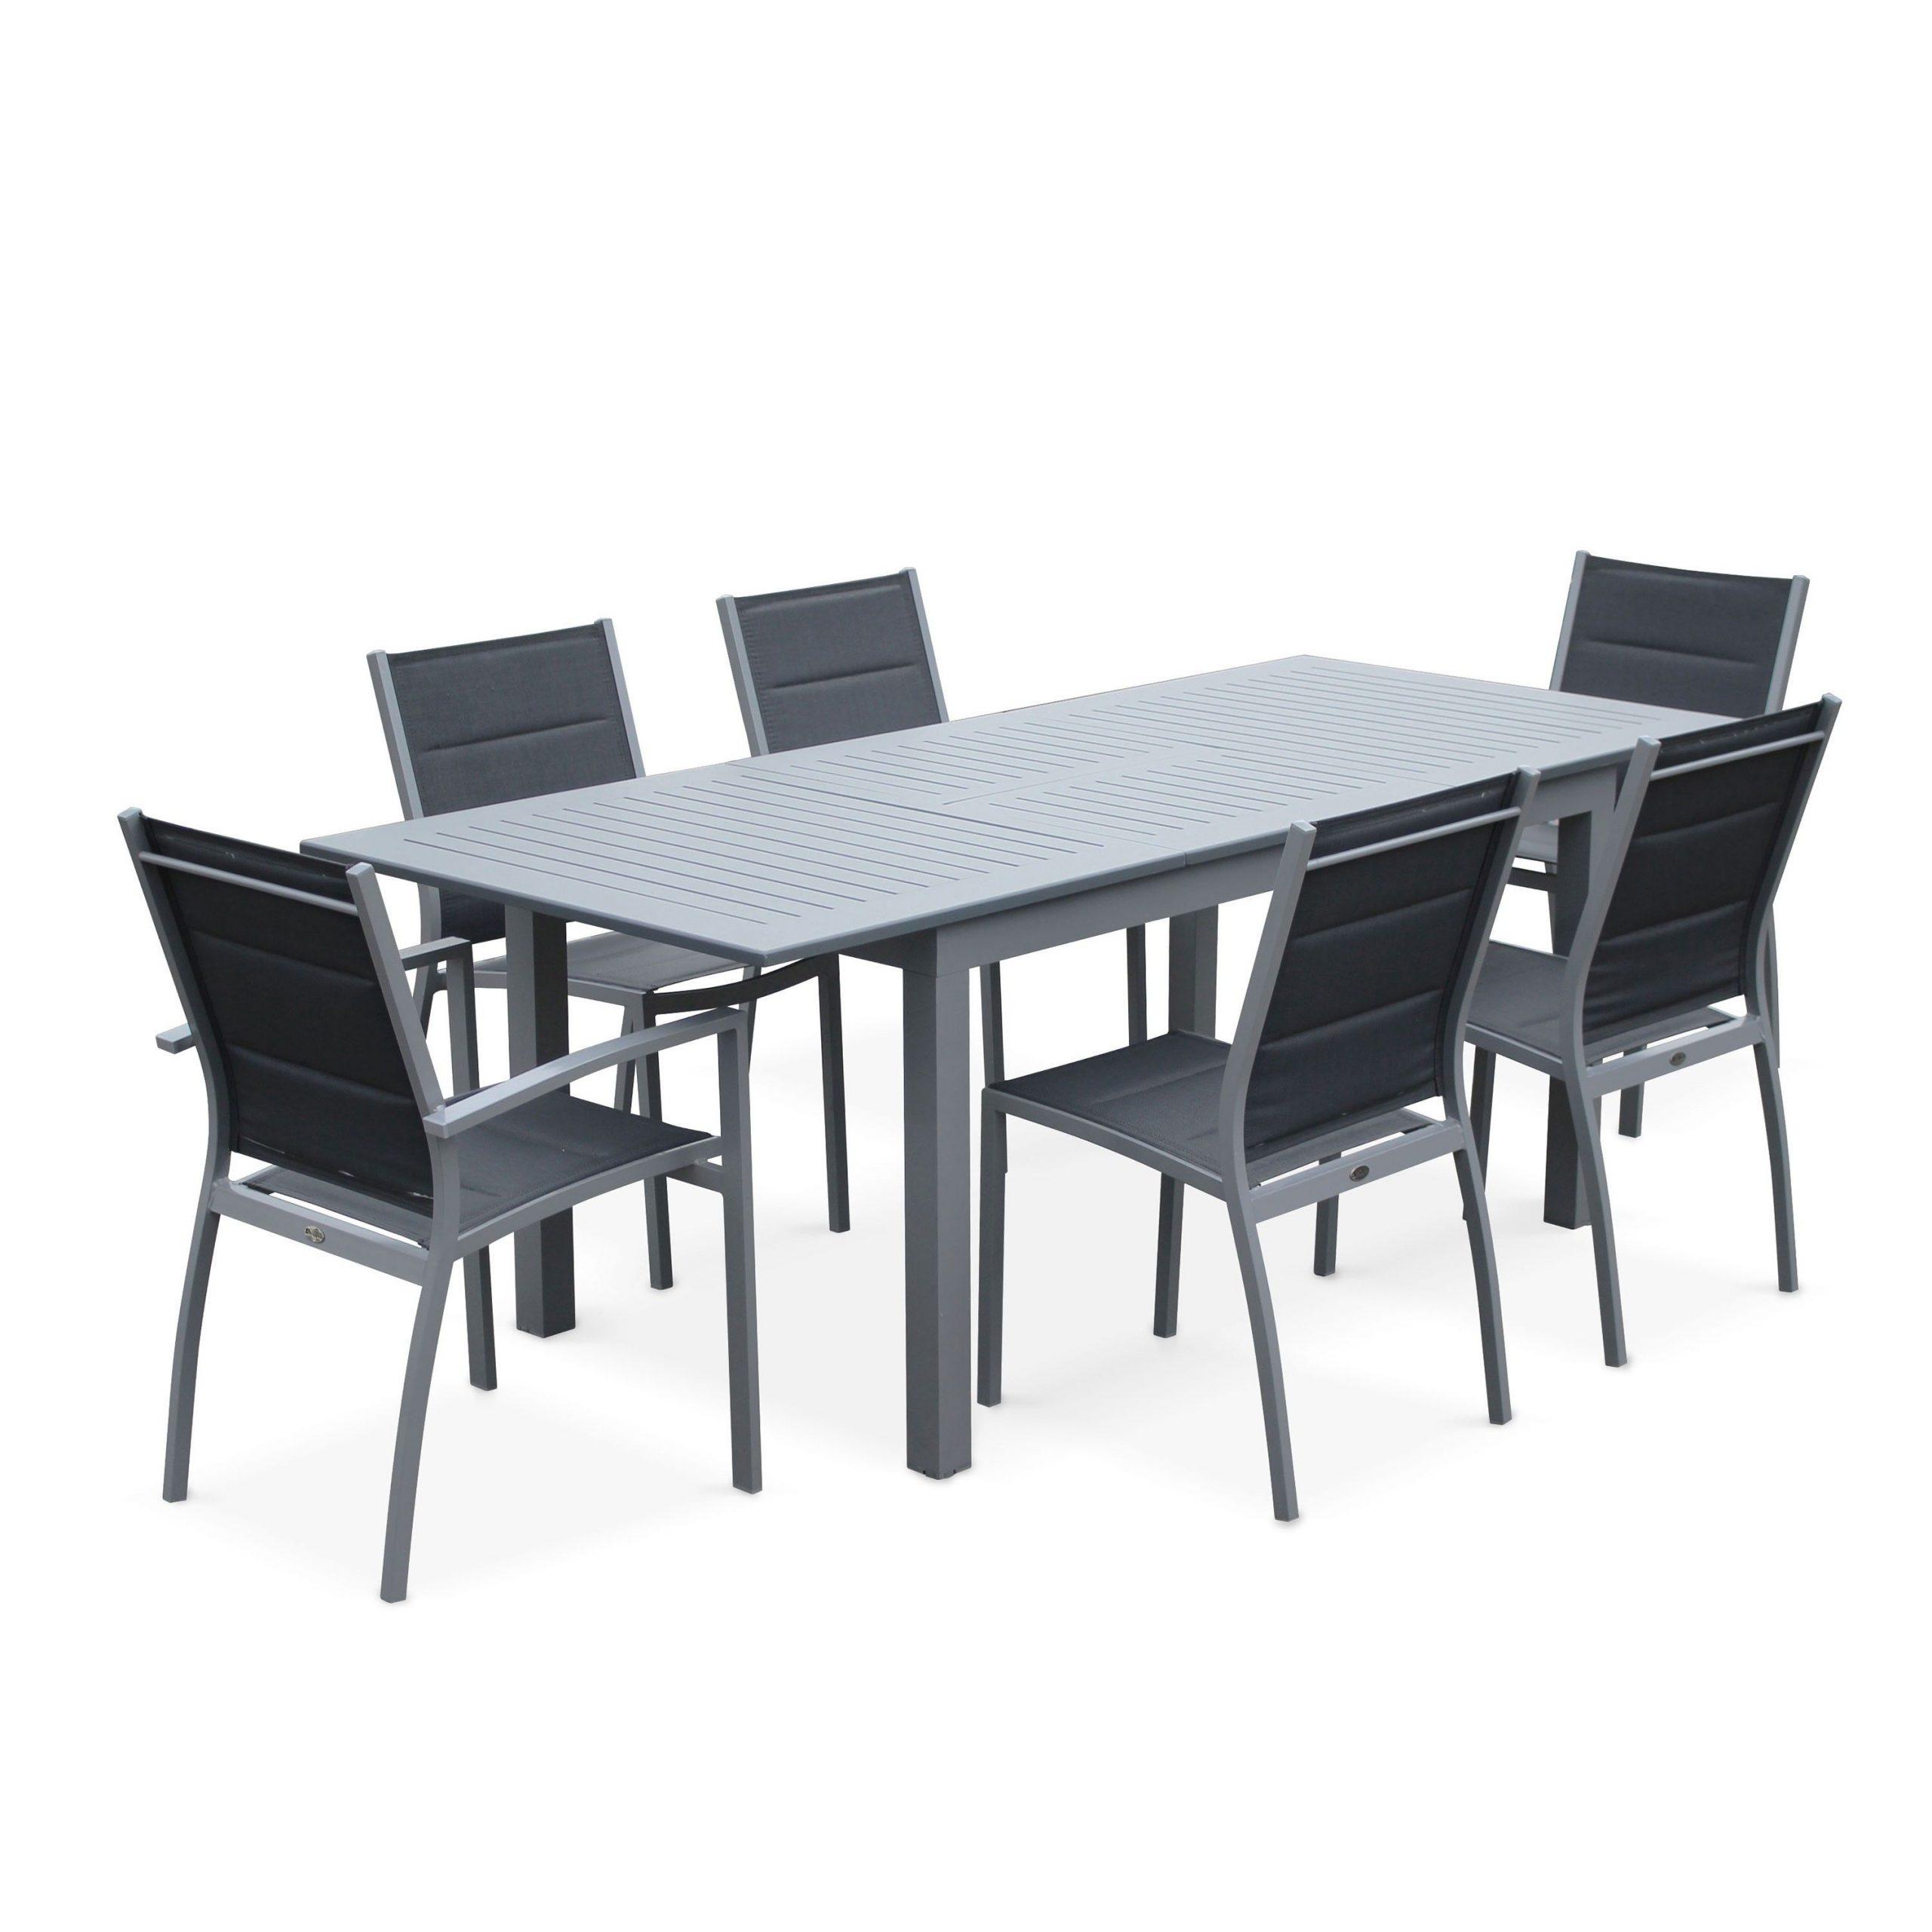 Chicago 210   Terrasse   Table Extensible, Table De Jardin ... dedans Salon De Jardin Aluminium 8 Places